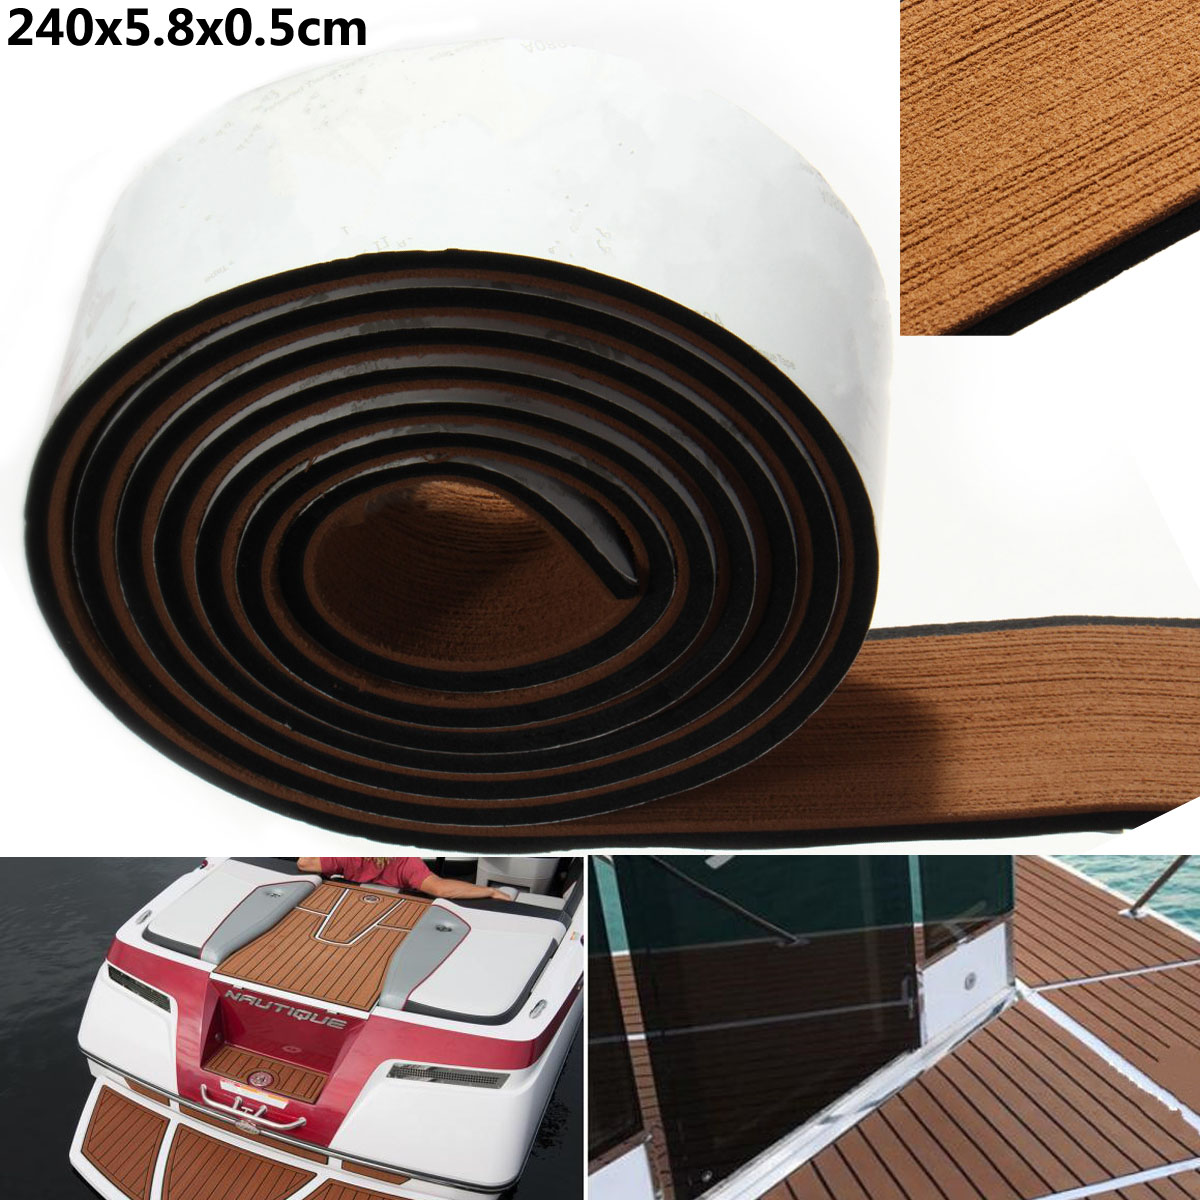 Self Adhesive EVA Boat Yacht Marine Flooring Faux Imitation Teak Decking Sheet Pad 58x2400x5mm Foam Floor Mat Brown Wholesale